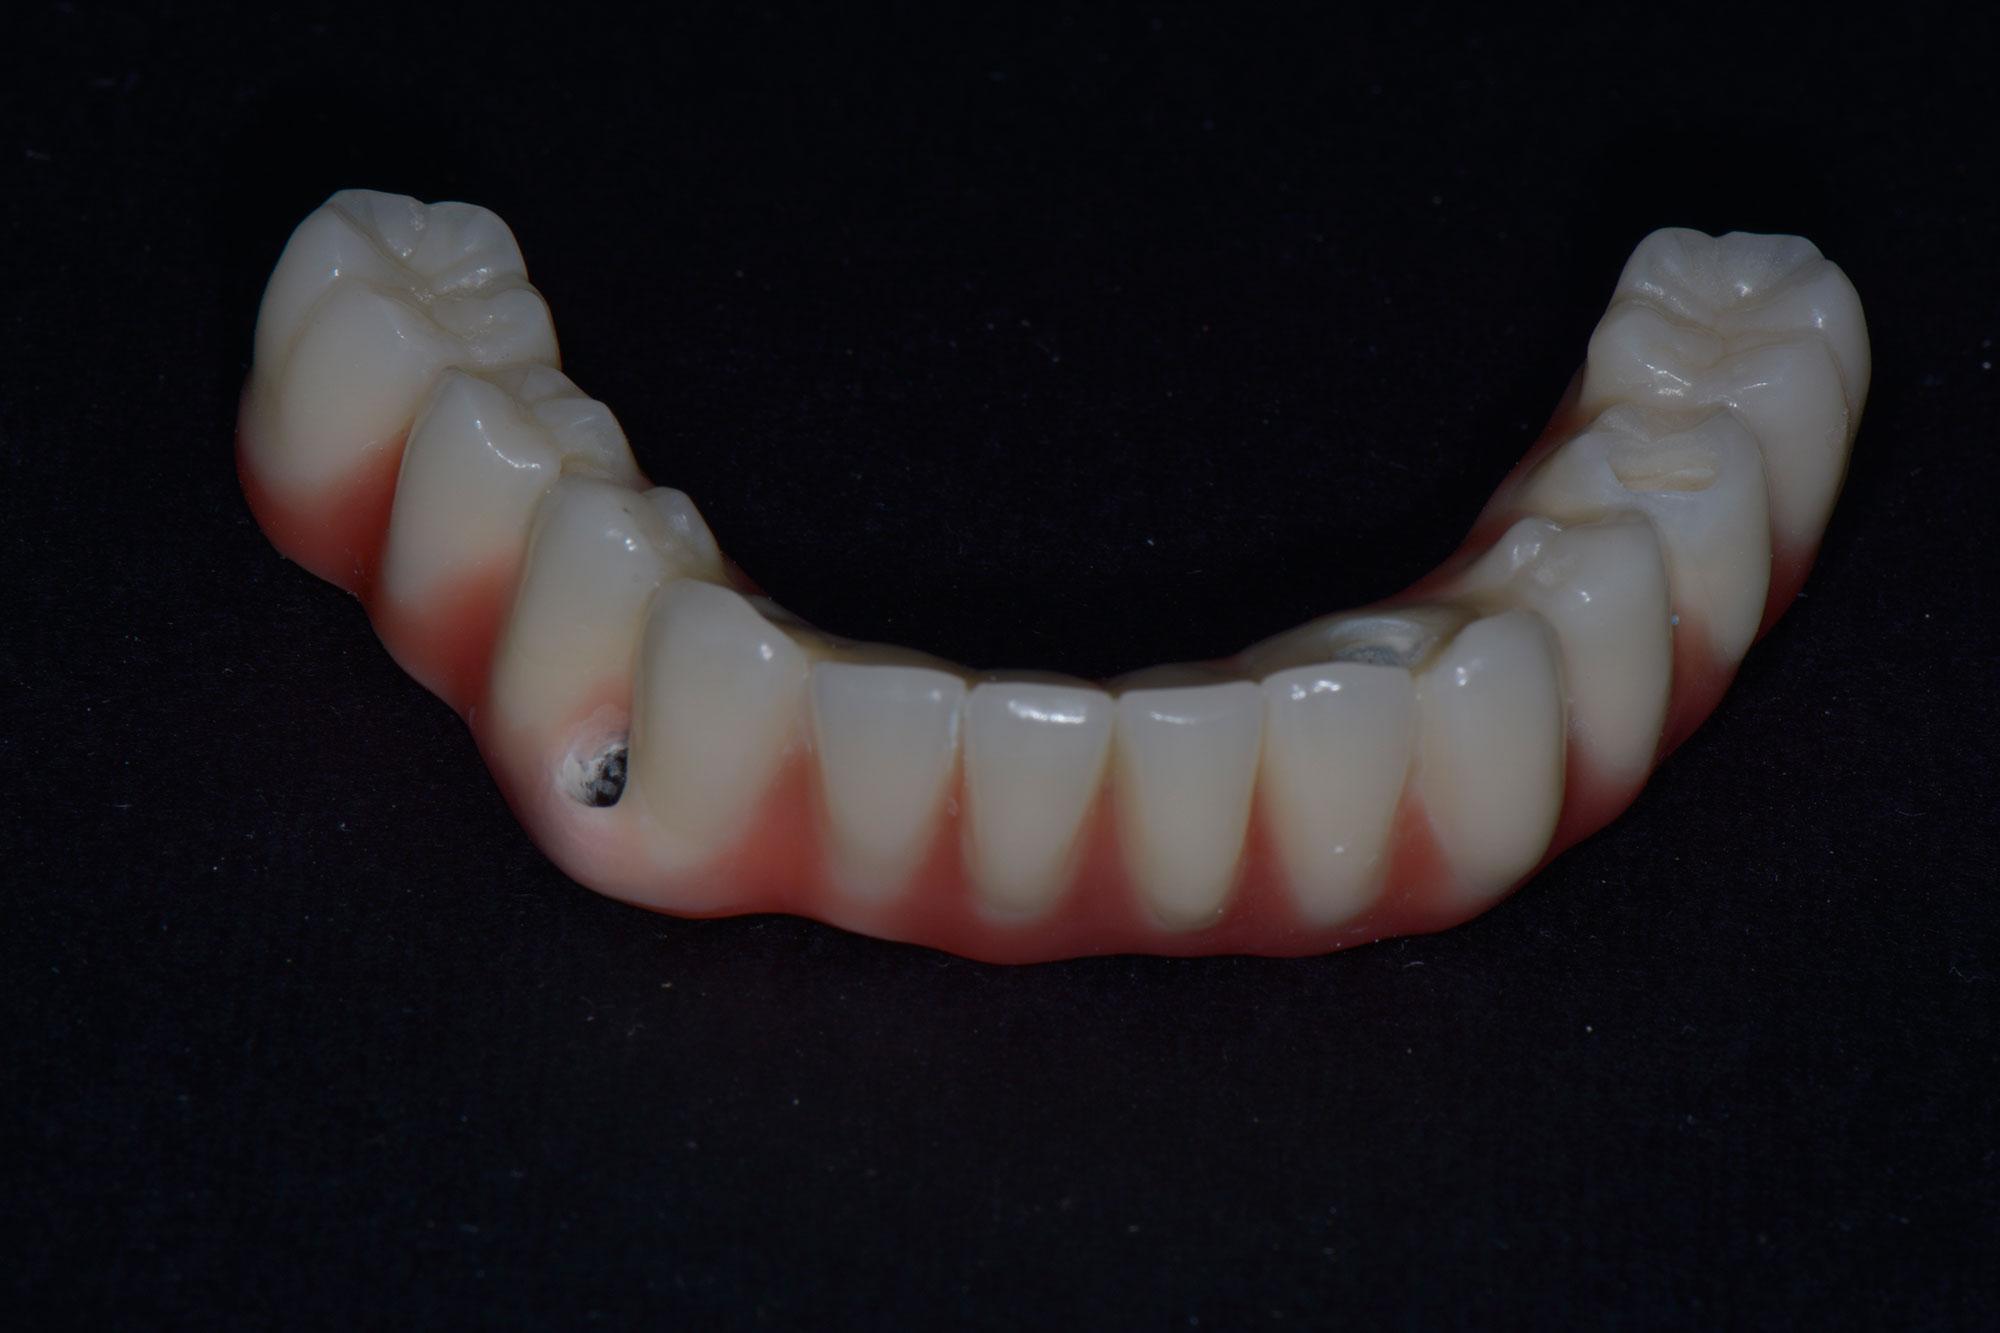 Case Study 5 - فقدان اسنان الفك السفلي